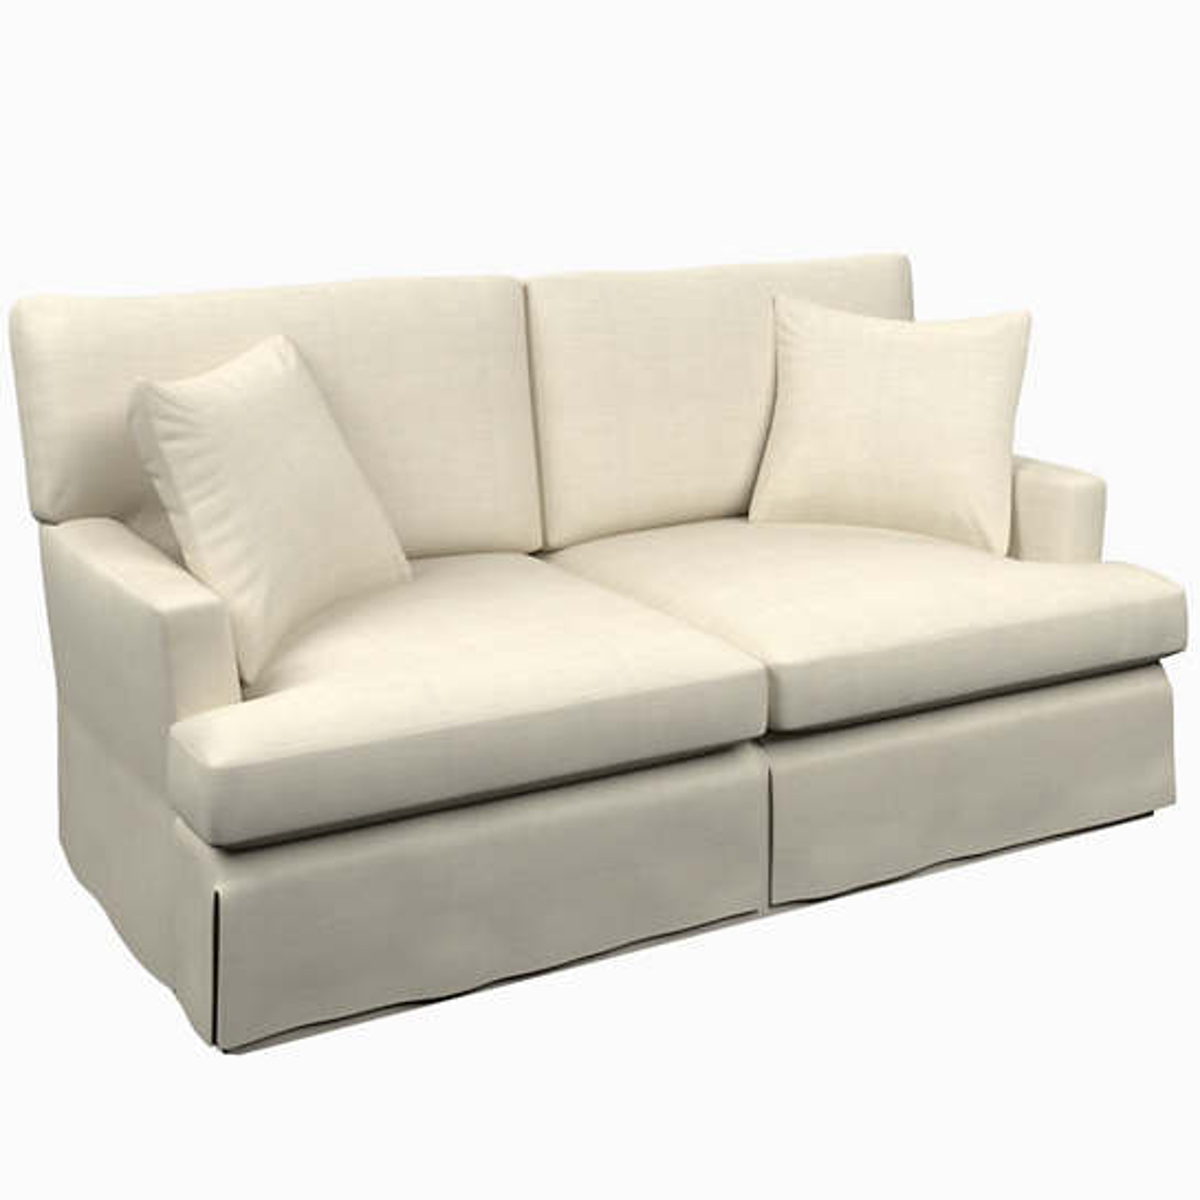 Estate Linen Pearl Grey Saybrook 2 Seater Slipcovered Sofa